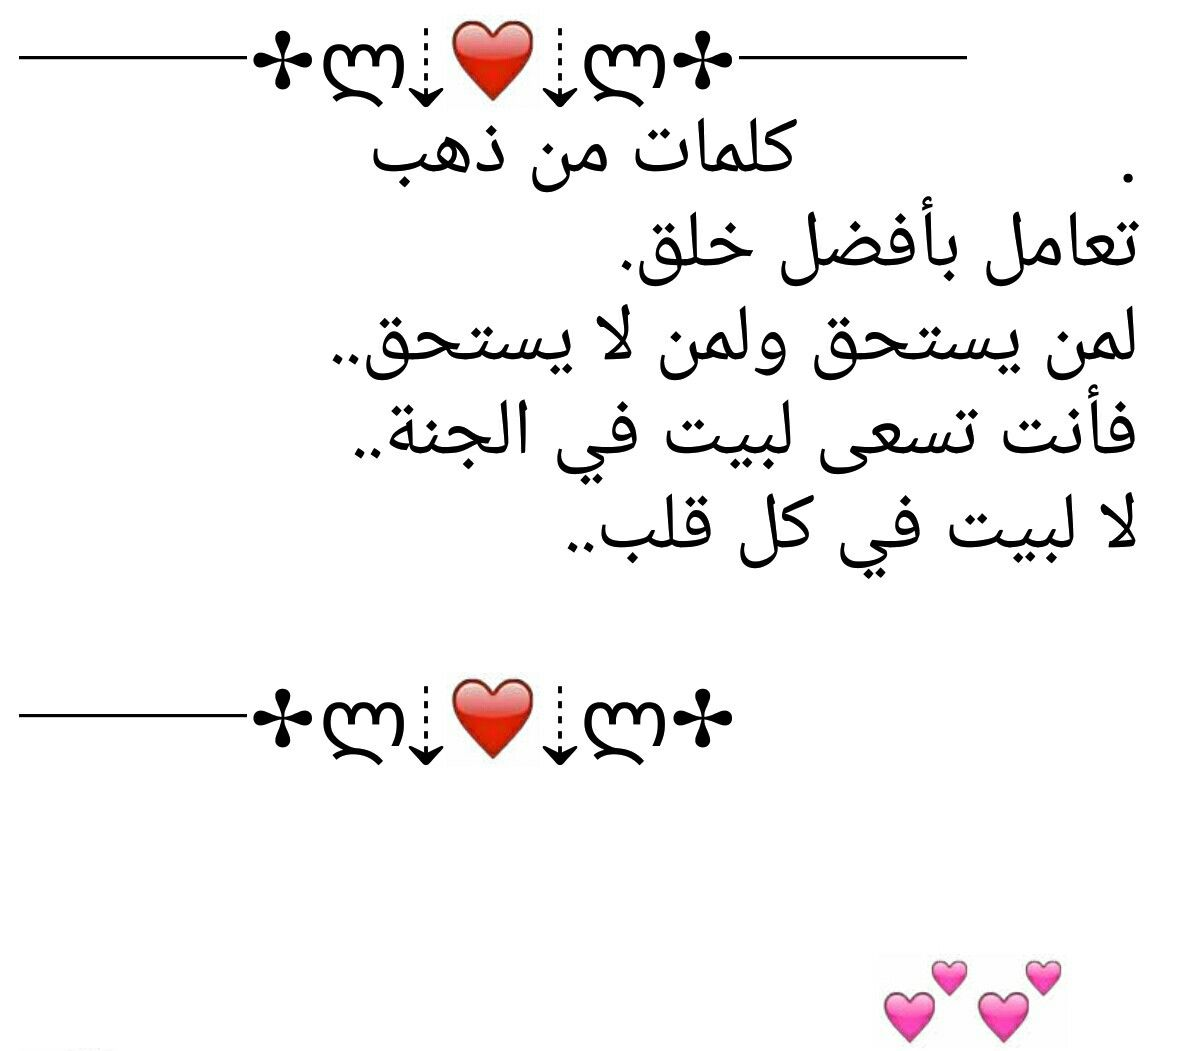 كلمات من ذهب Arabic Calligraphy Calligraphy